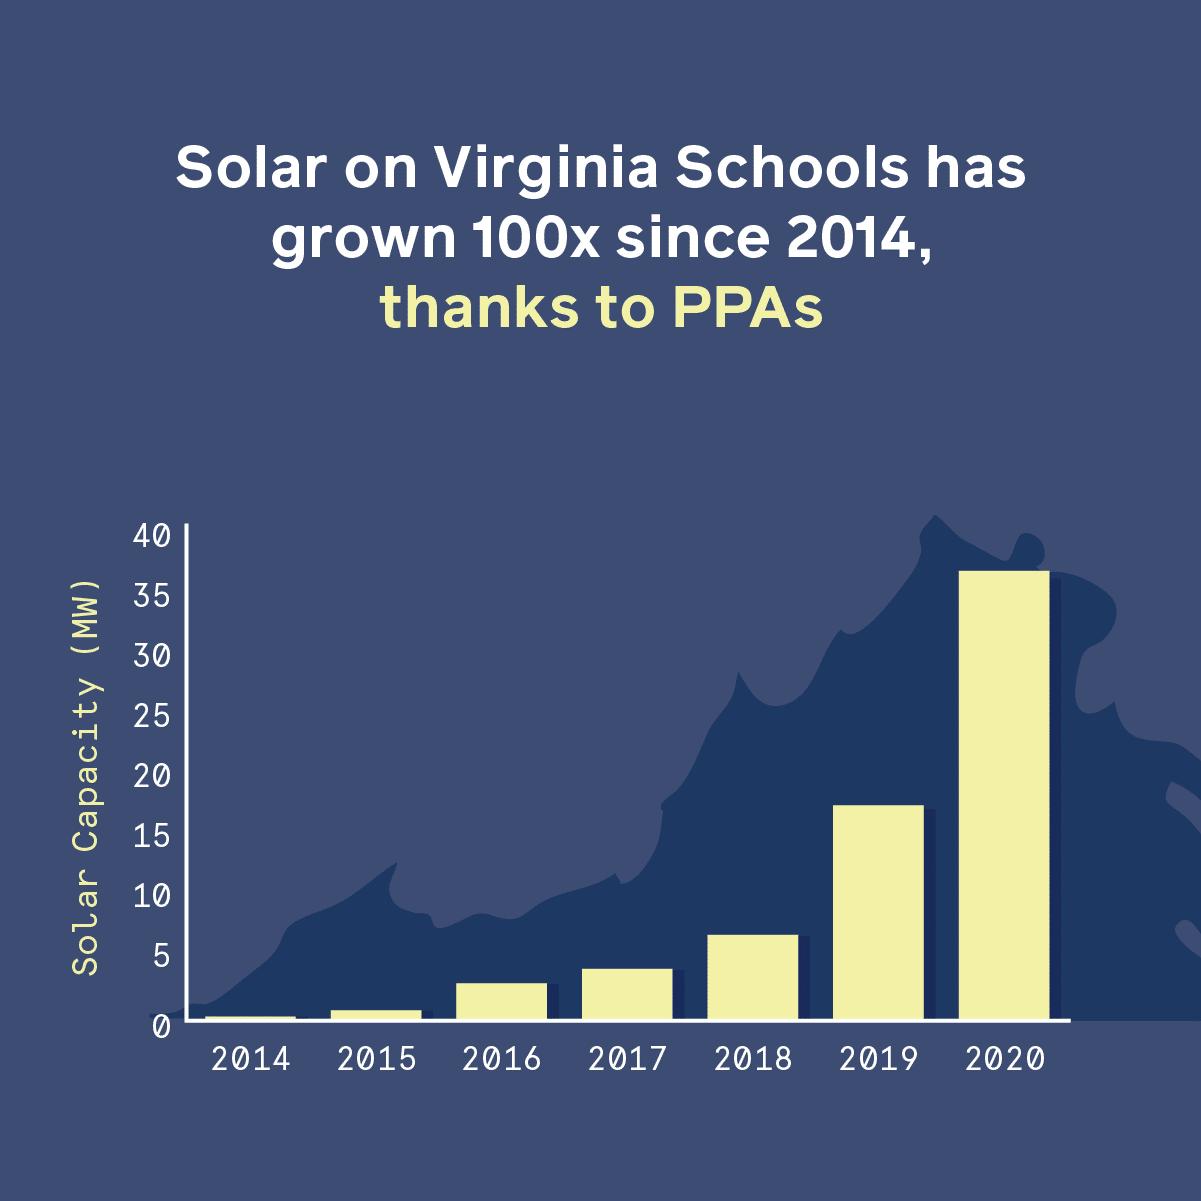 solar on virginia schools has grown 100x since 2014